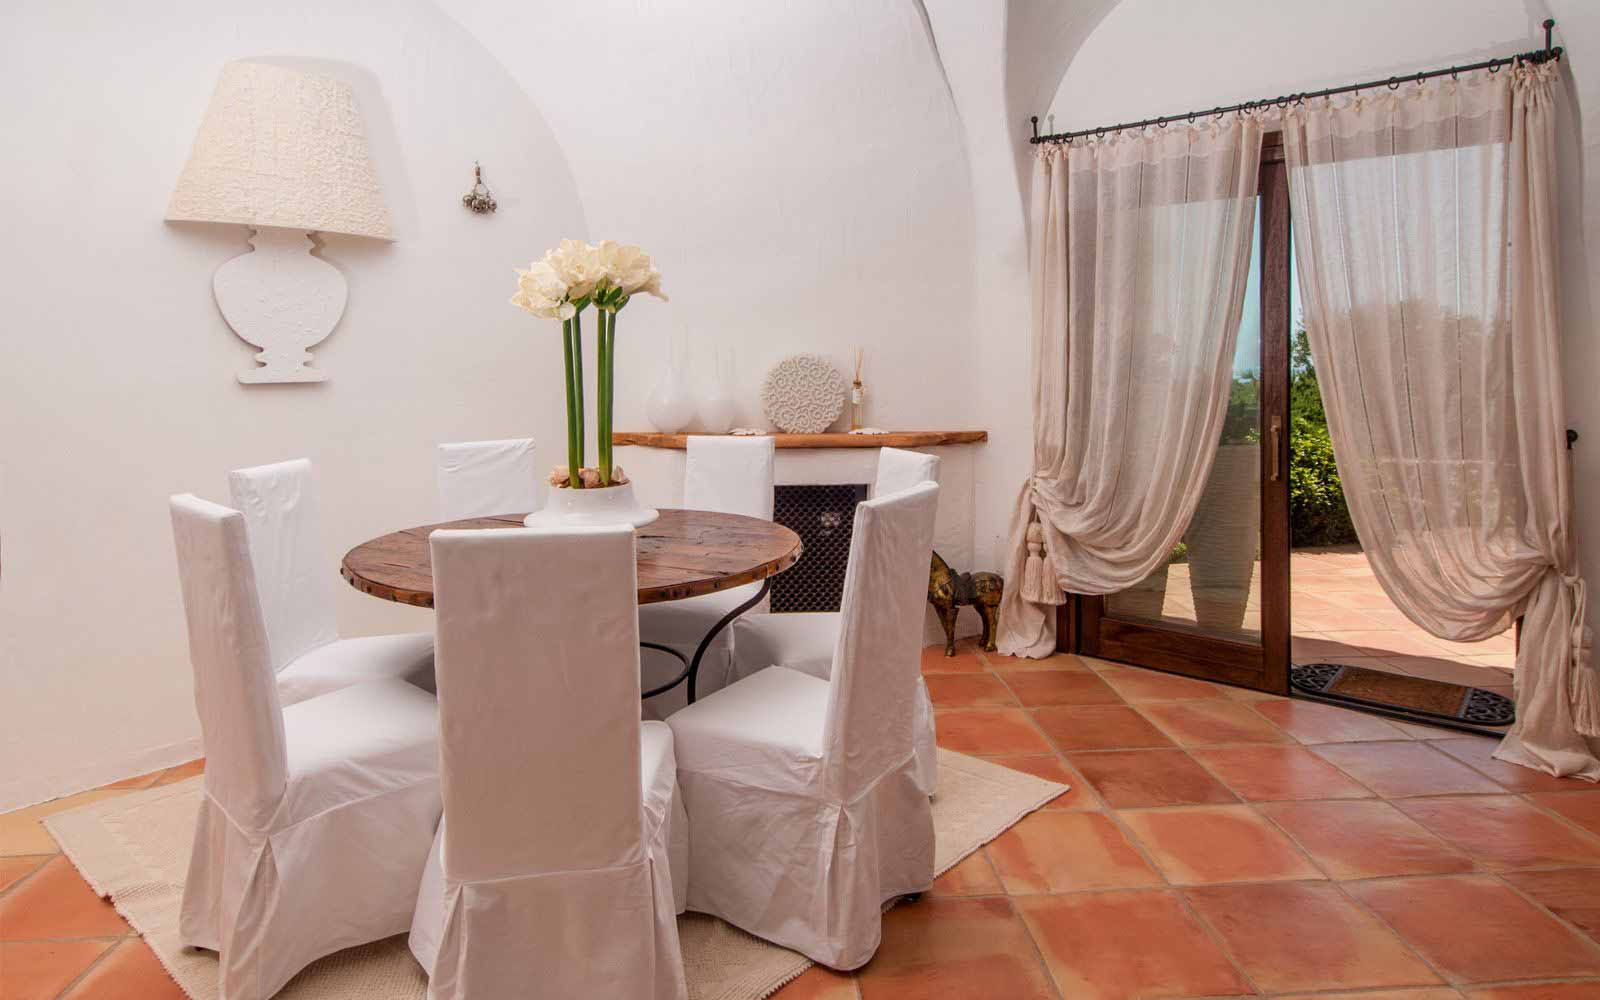 Villa Luna: room / property / locale photo. Image 9